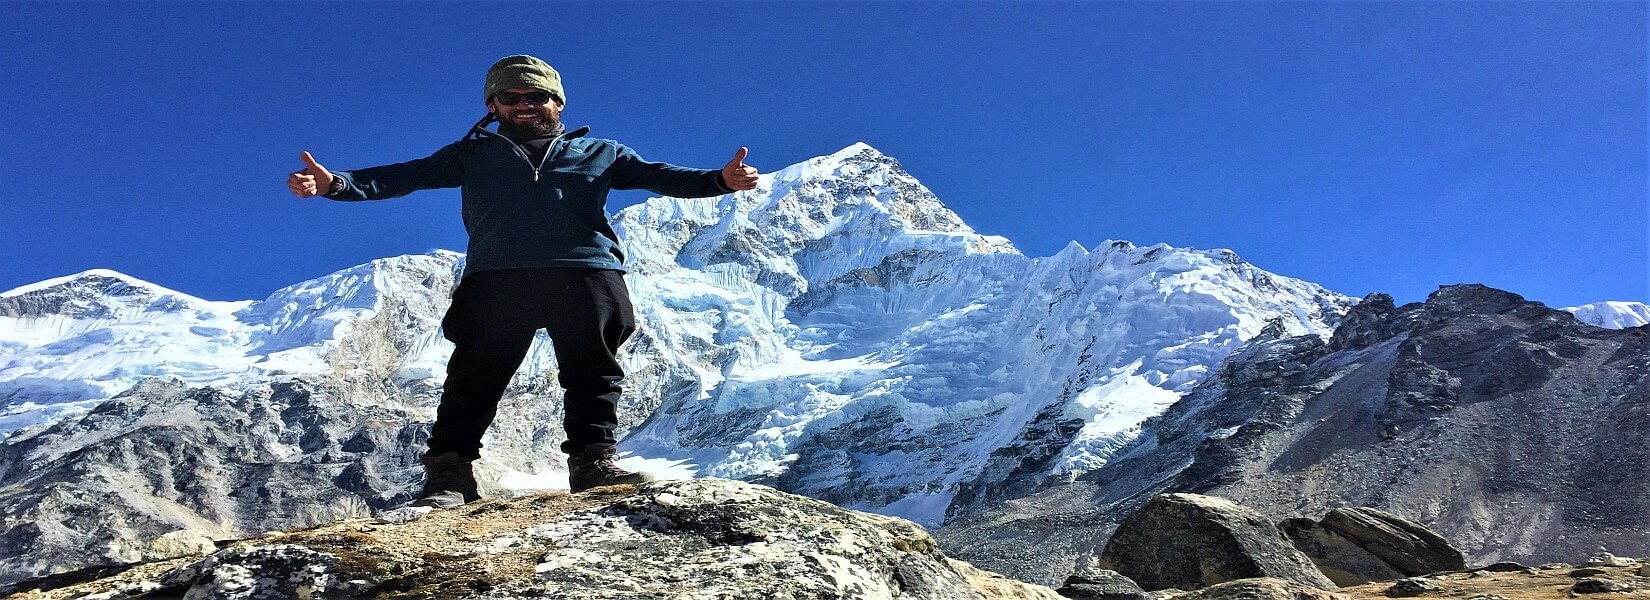 Everest Base Camp Trek With Yoga Retreat FAQ For Beginner.